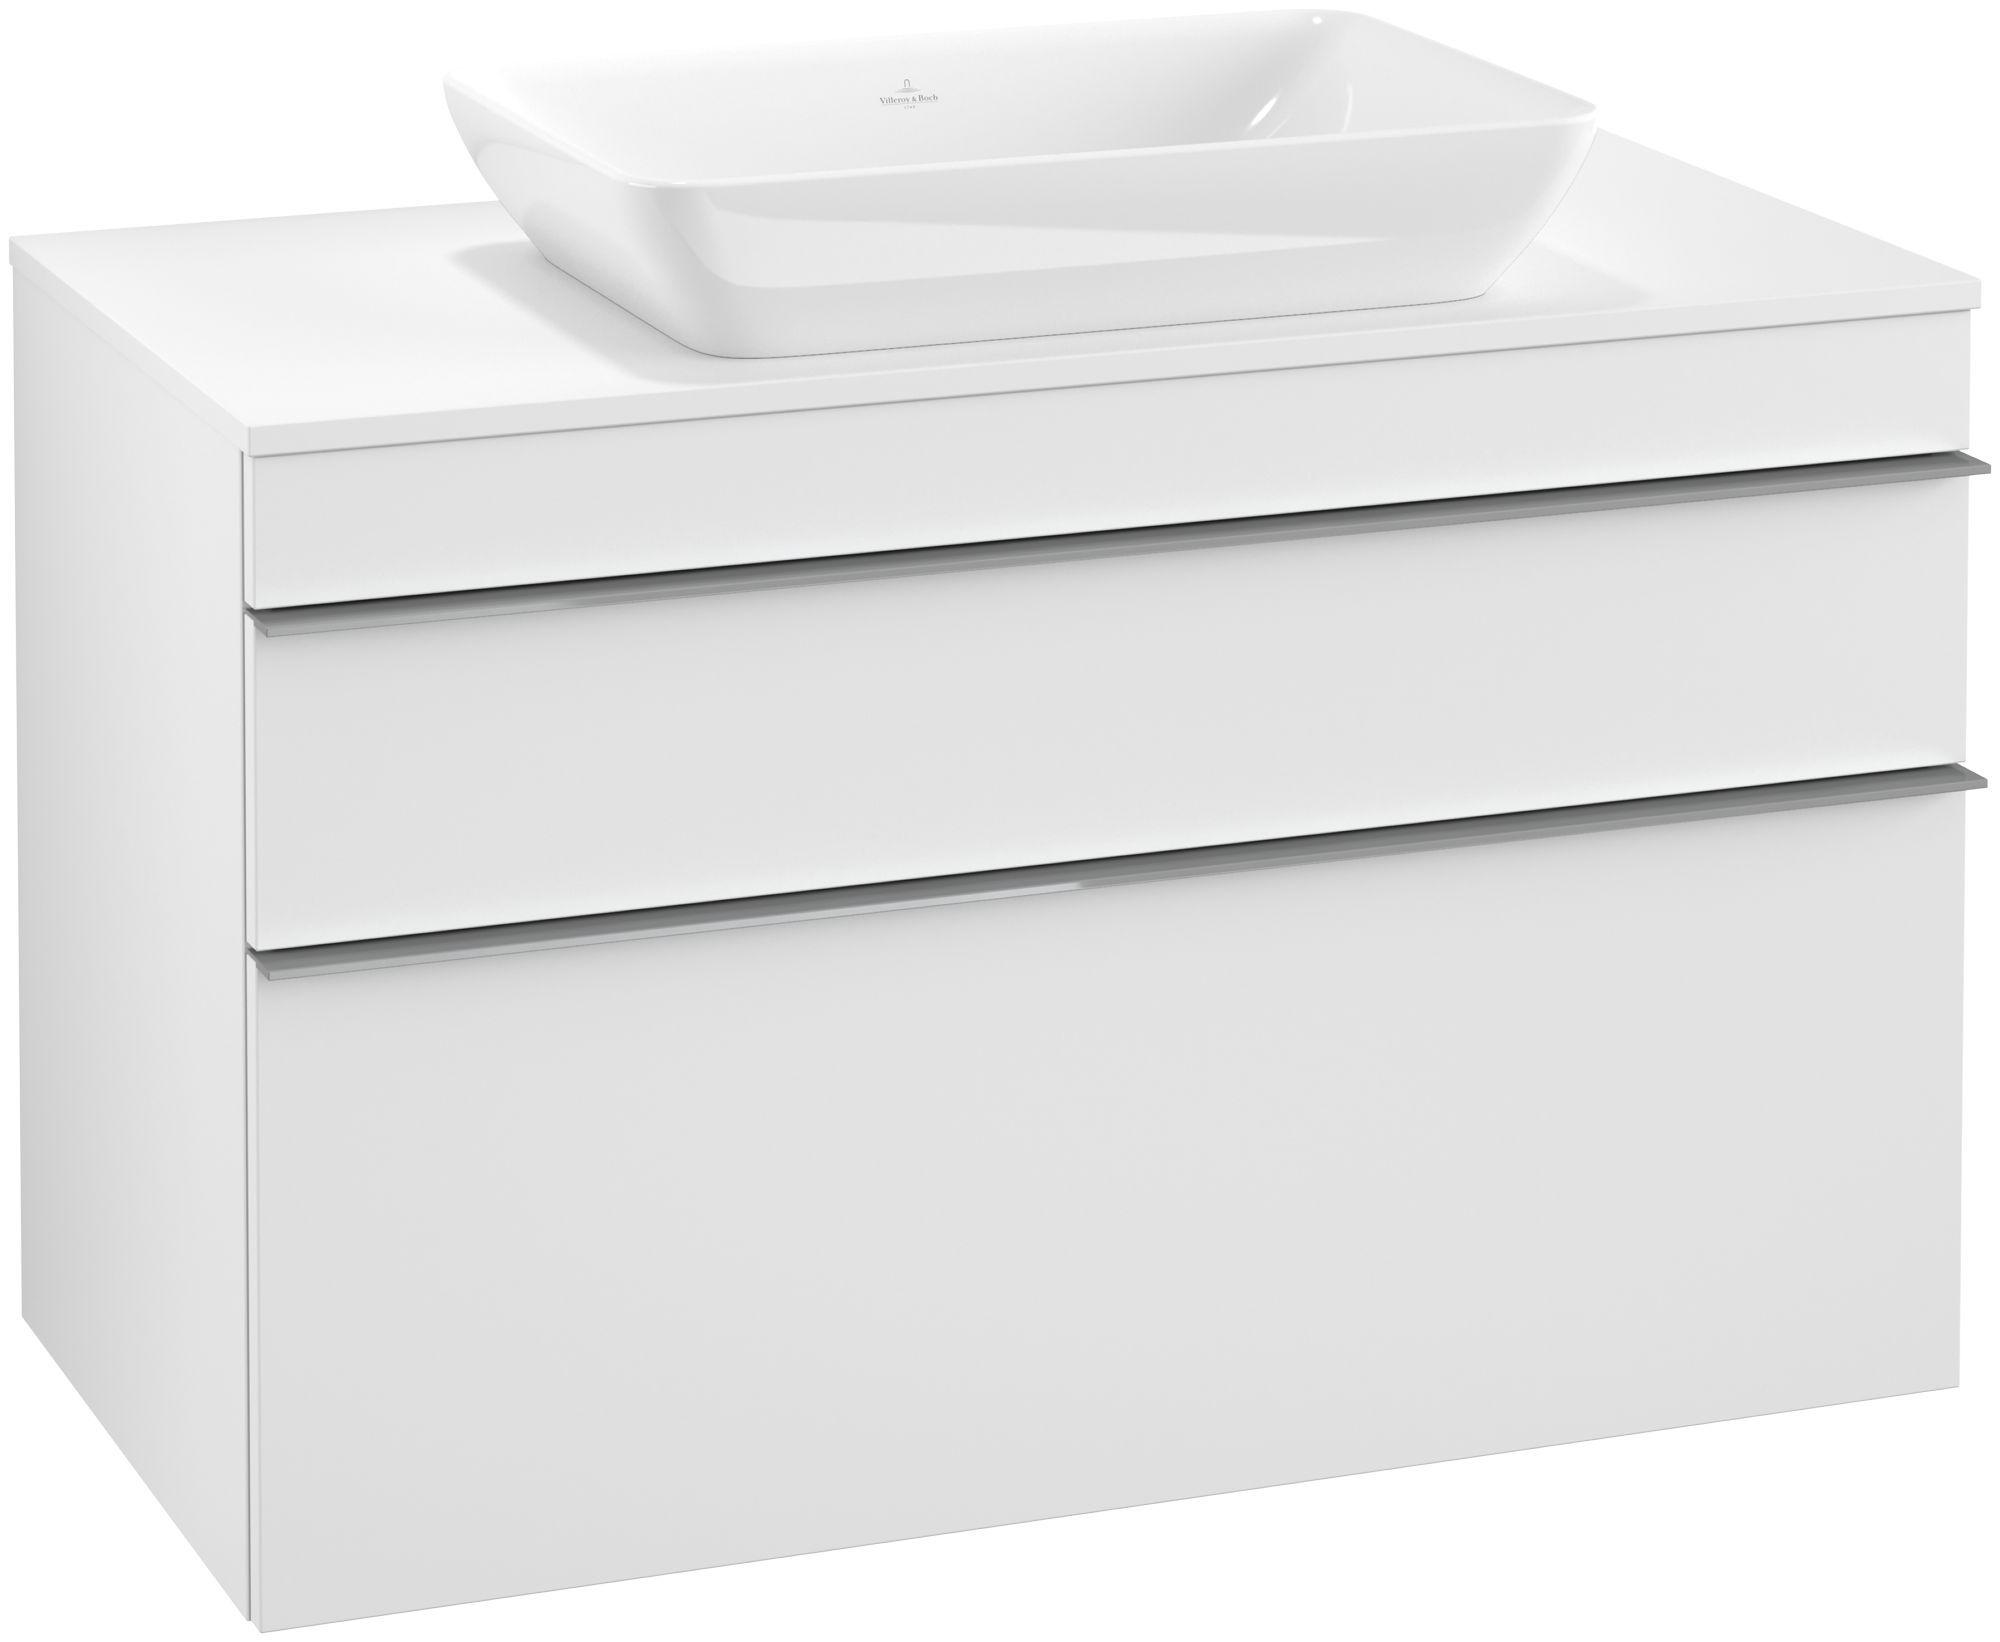 Villeroy & Boch Venticello Waschtischunterschrank 2 Auszüge B:957xT:502xH:606mm weiß matt Griffe grau A94103MS